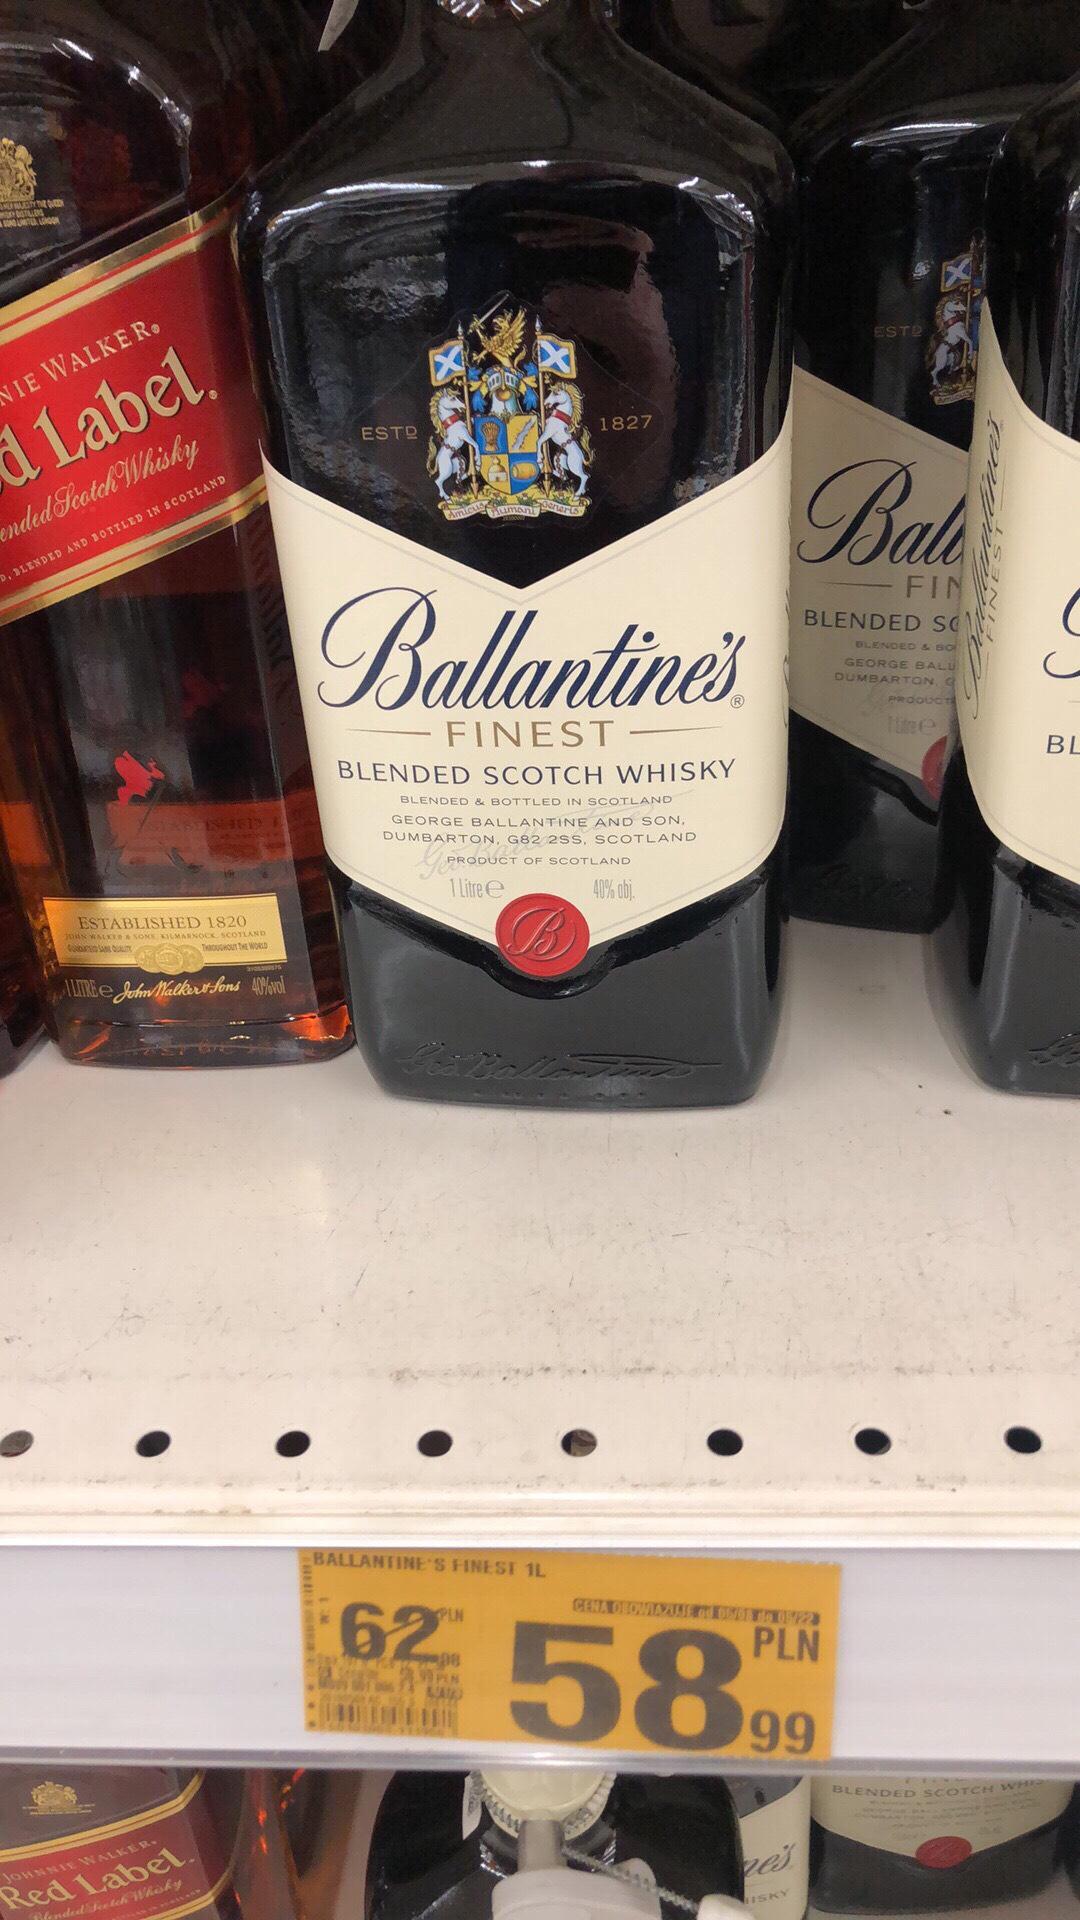 Ballantines 1 L 58,99 Auchan Radom M1